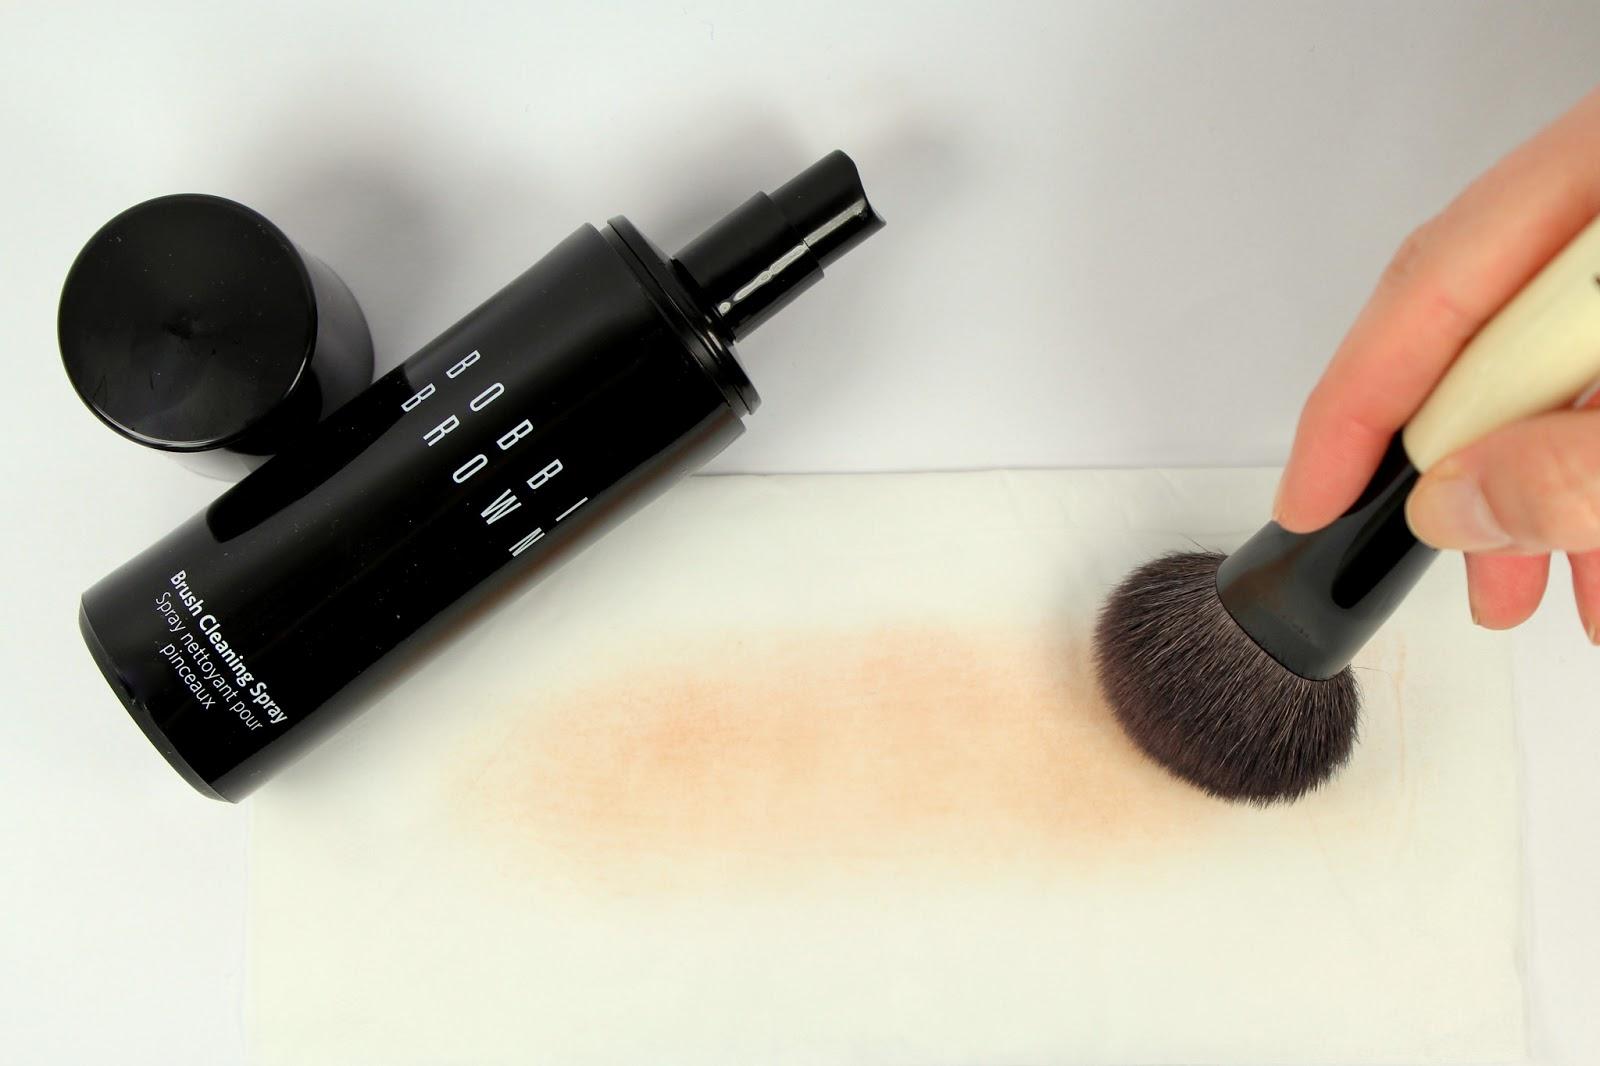 Brush Cleansing Spray